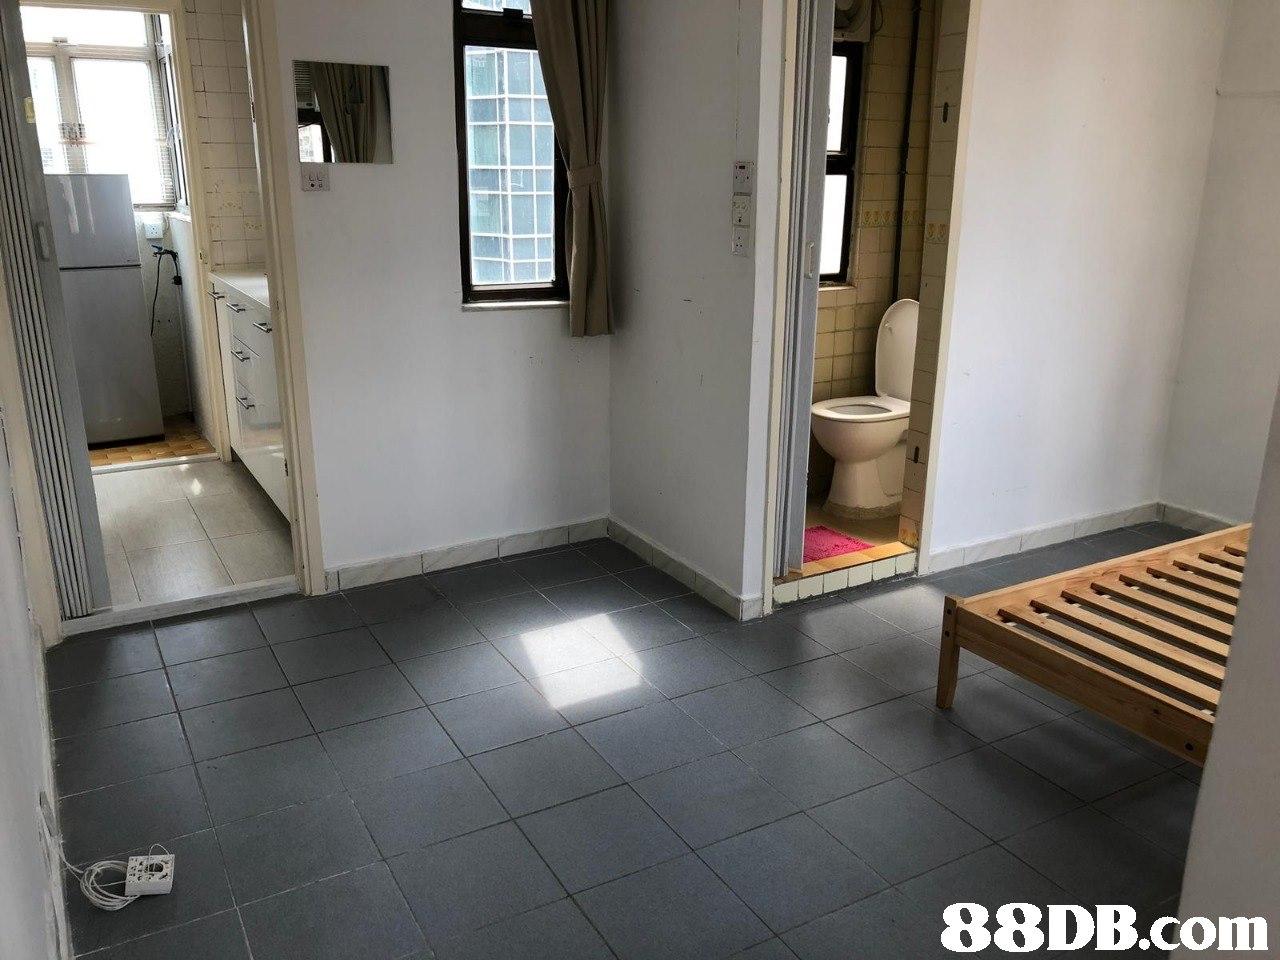 property,floor,room,flooring,tile